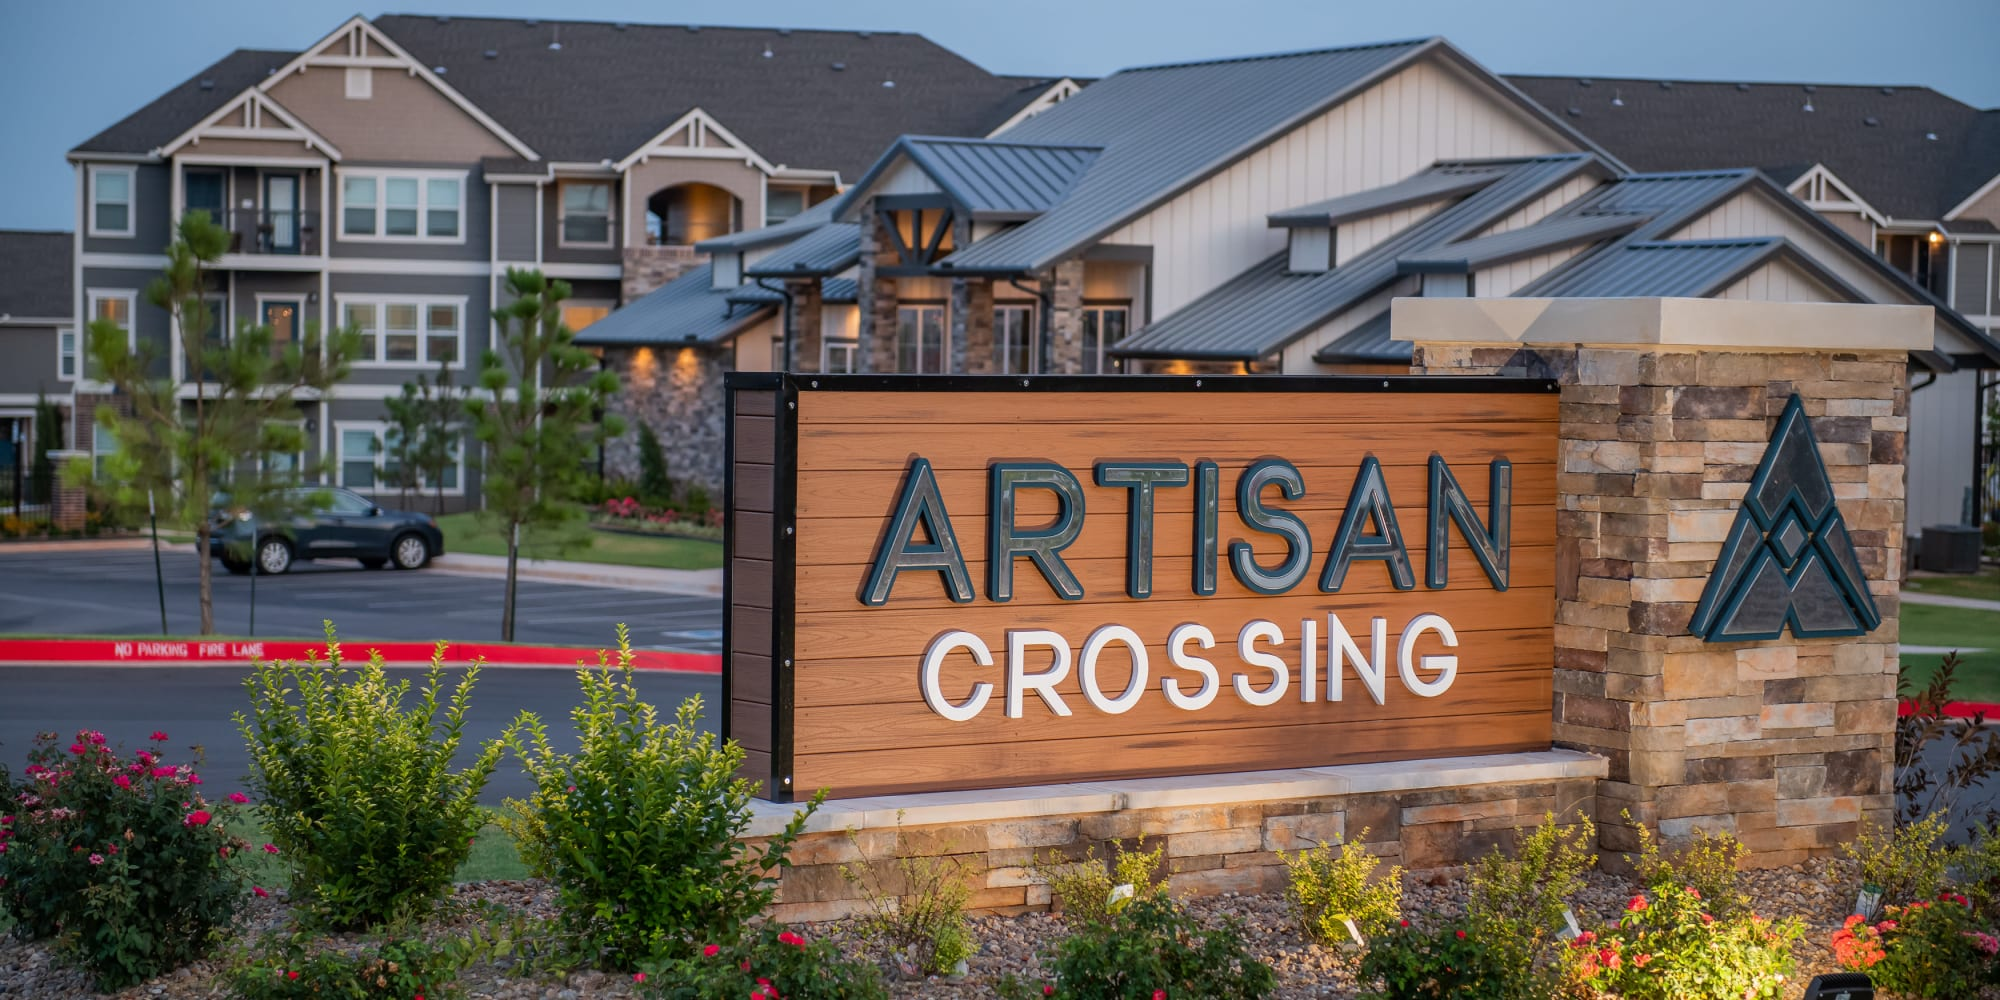 Apartments at Artisan Crossing in Norman, Oklahoma